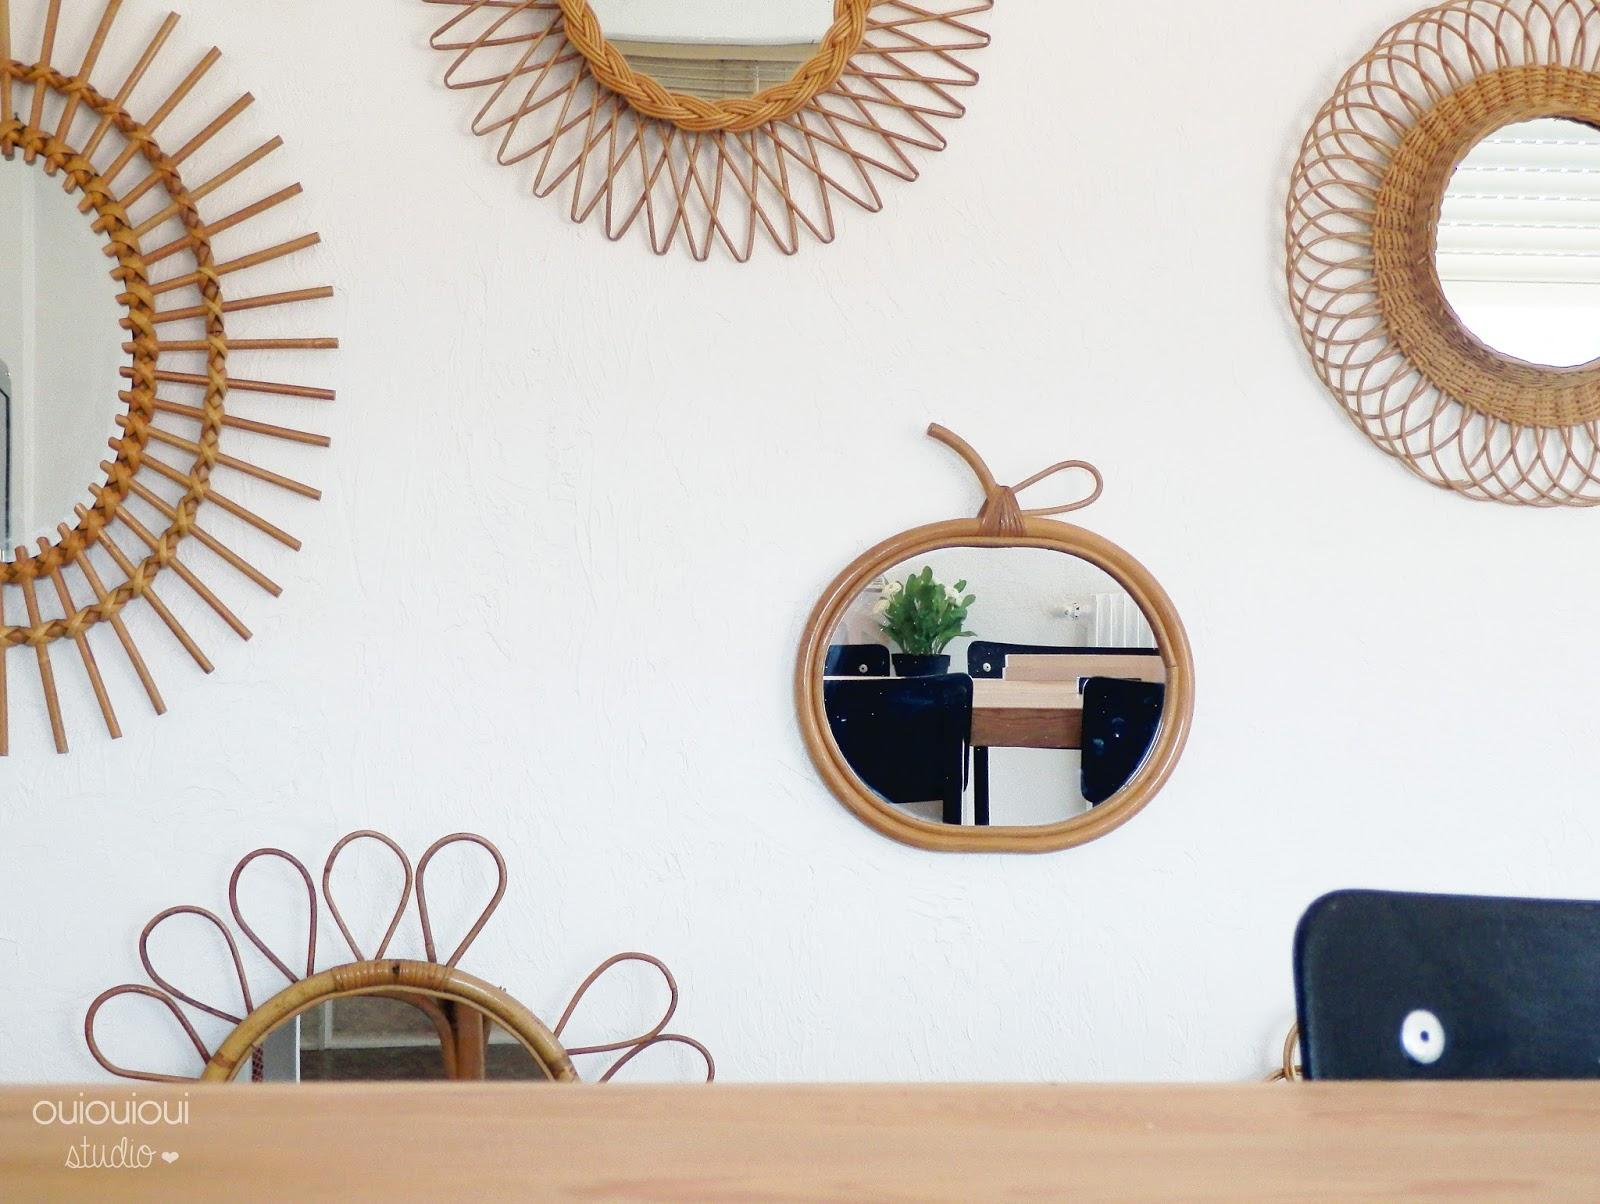 oui oui oui studio trouvailles xiii. Black Bedroom Furniture Sets. Home Design Ideas